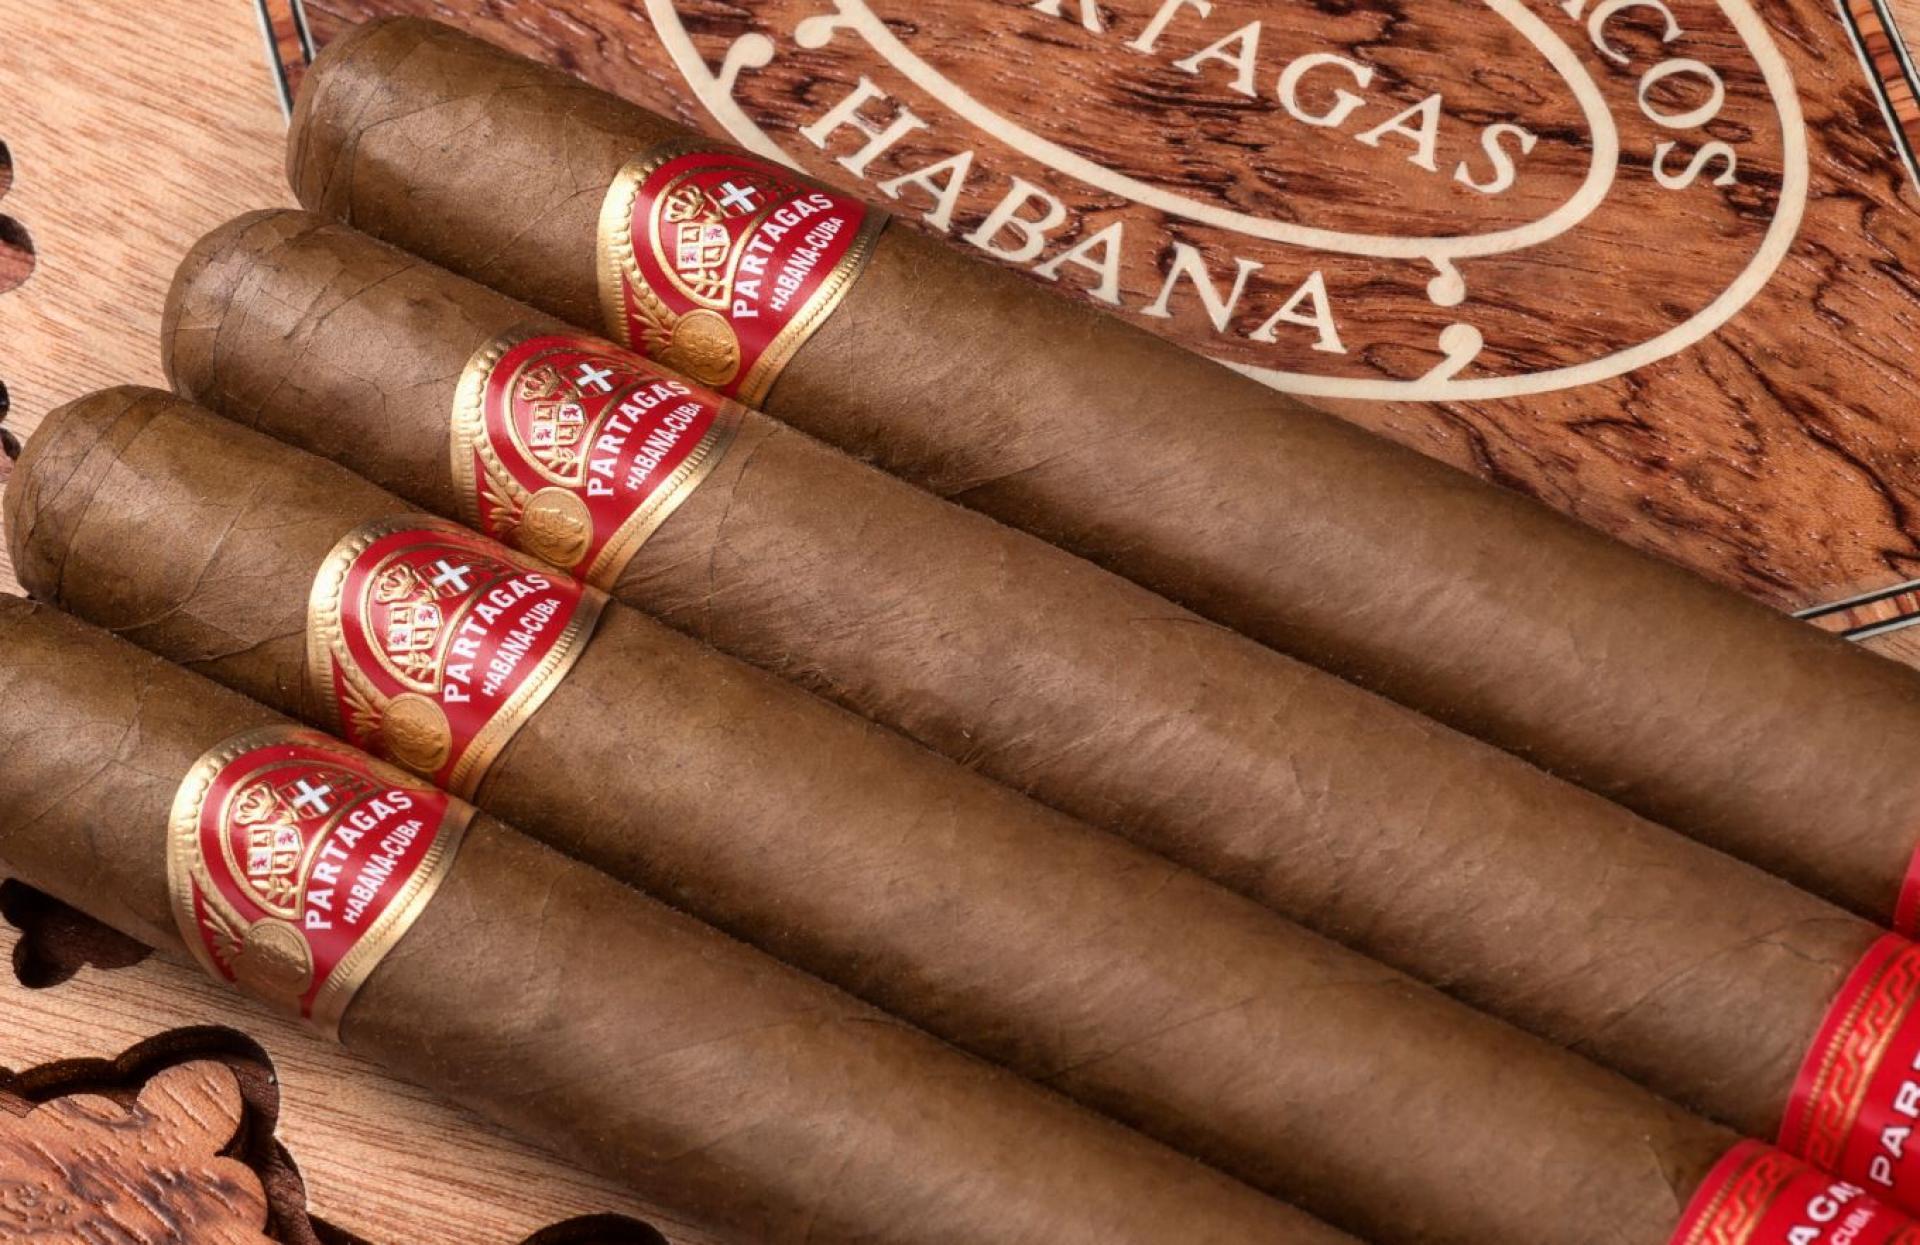 Partagas Tropicales 175th Anniversary Humidor